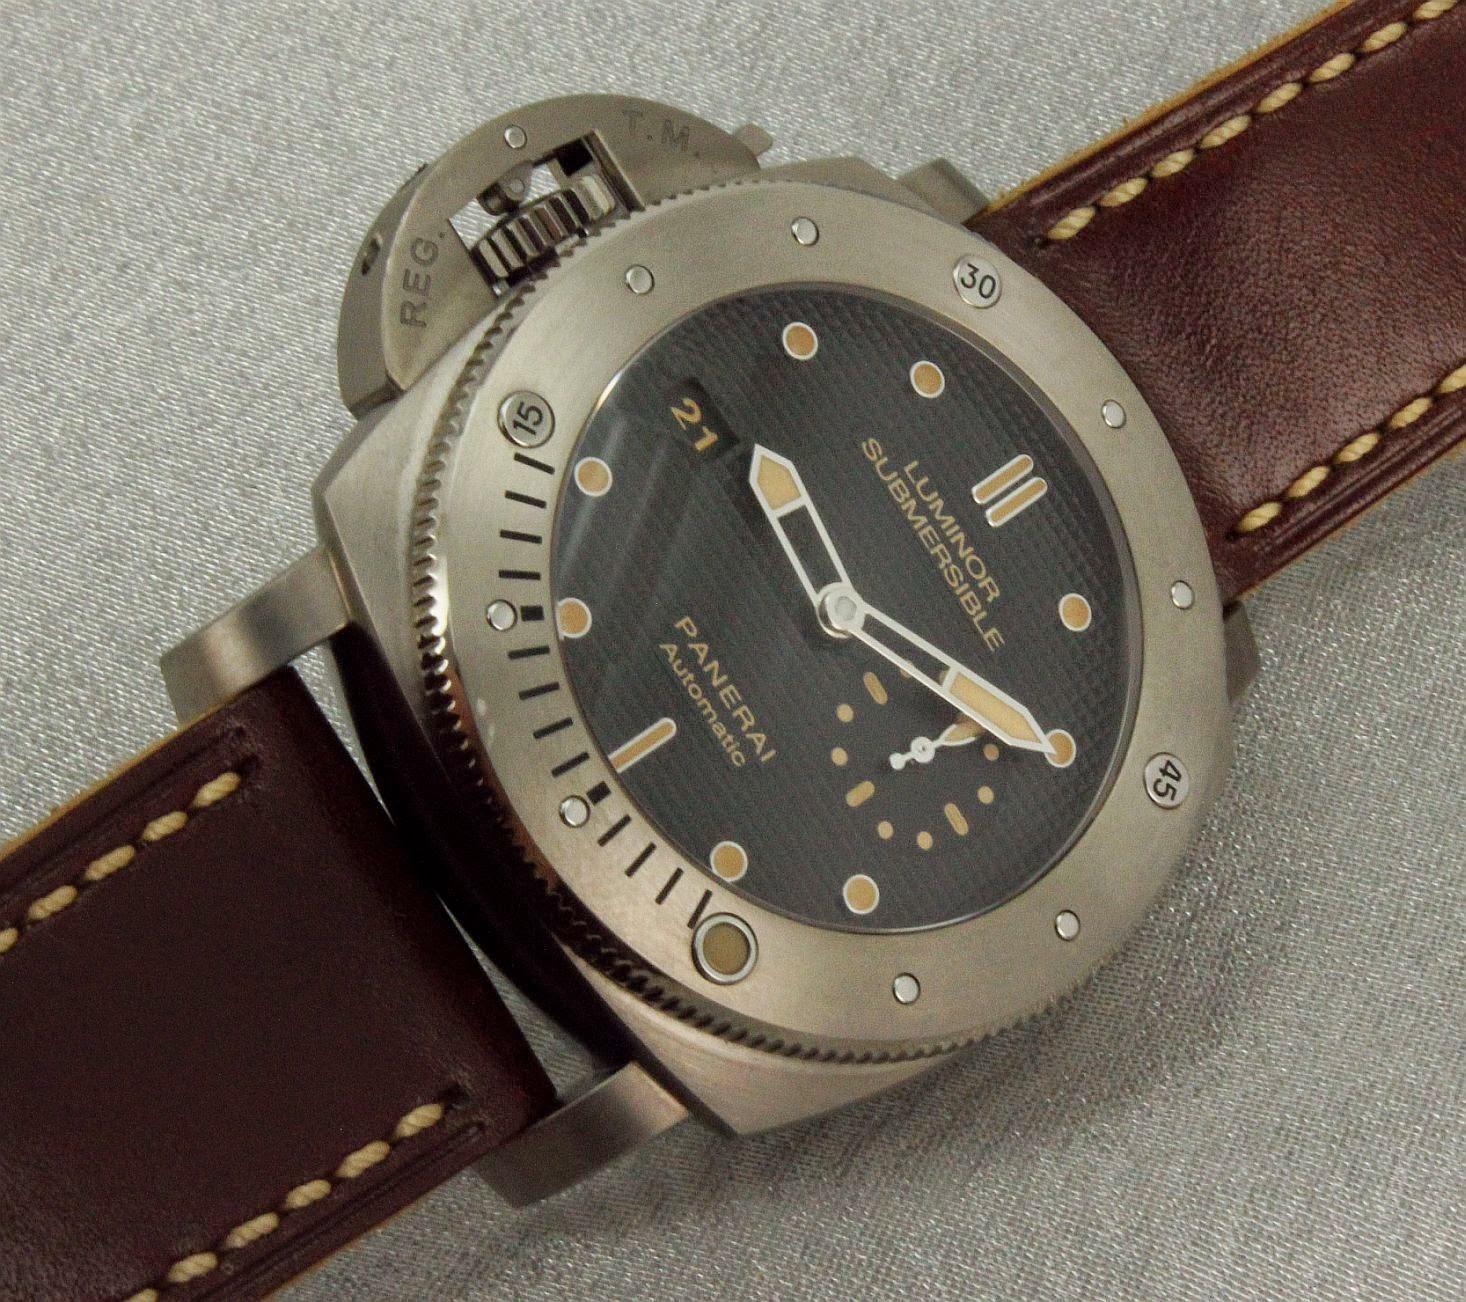 Wristwatch pictures panerai 569 titanium diver - Panerai dive watch ...